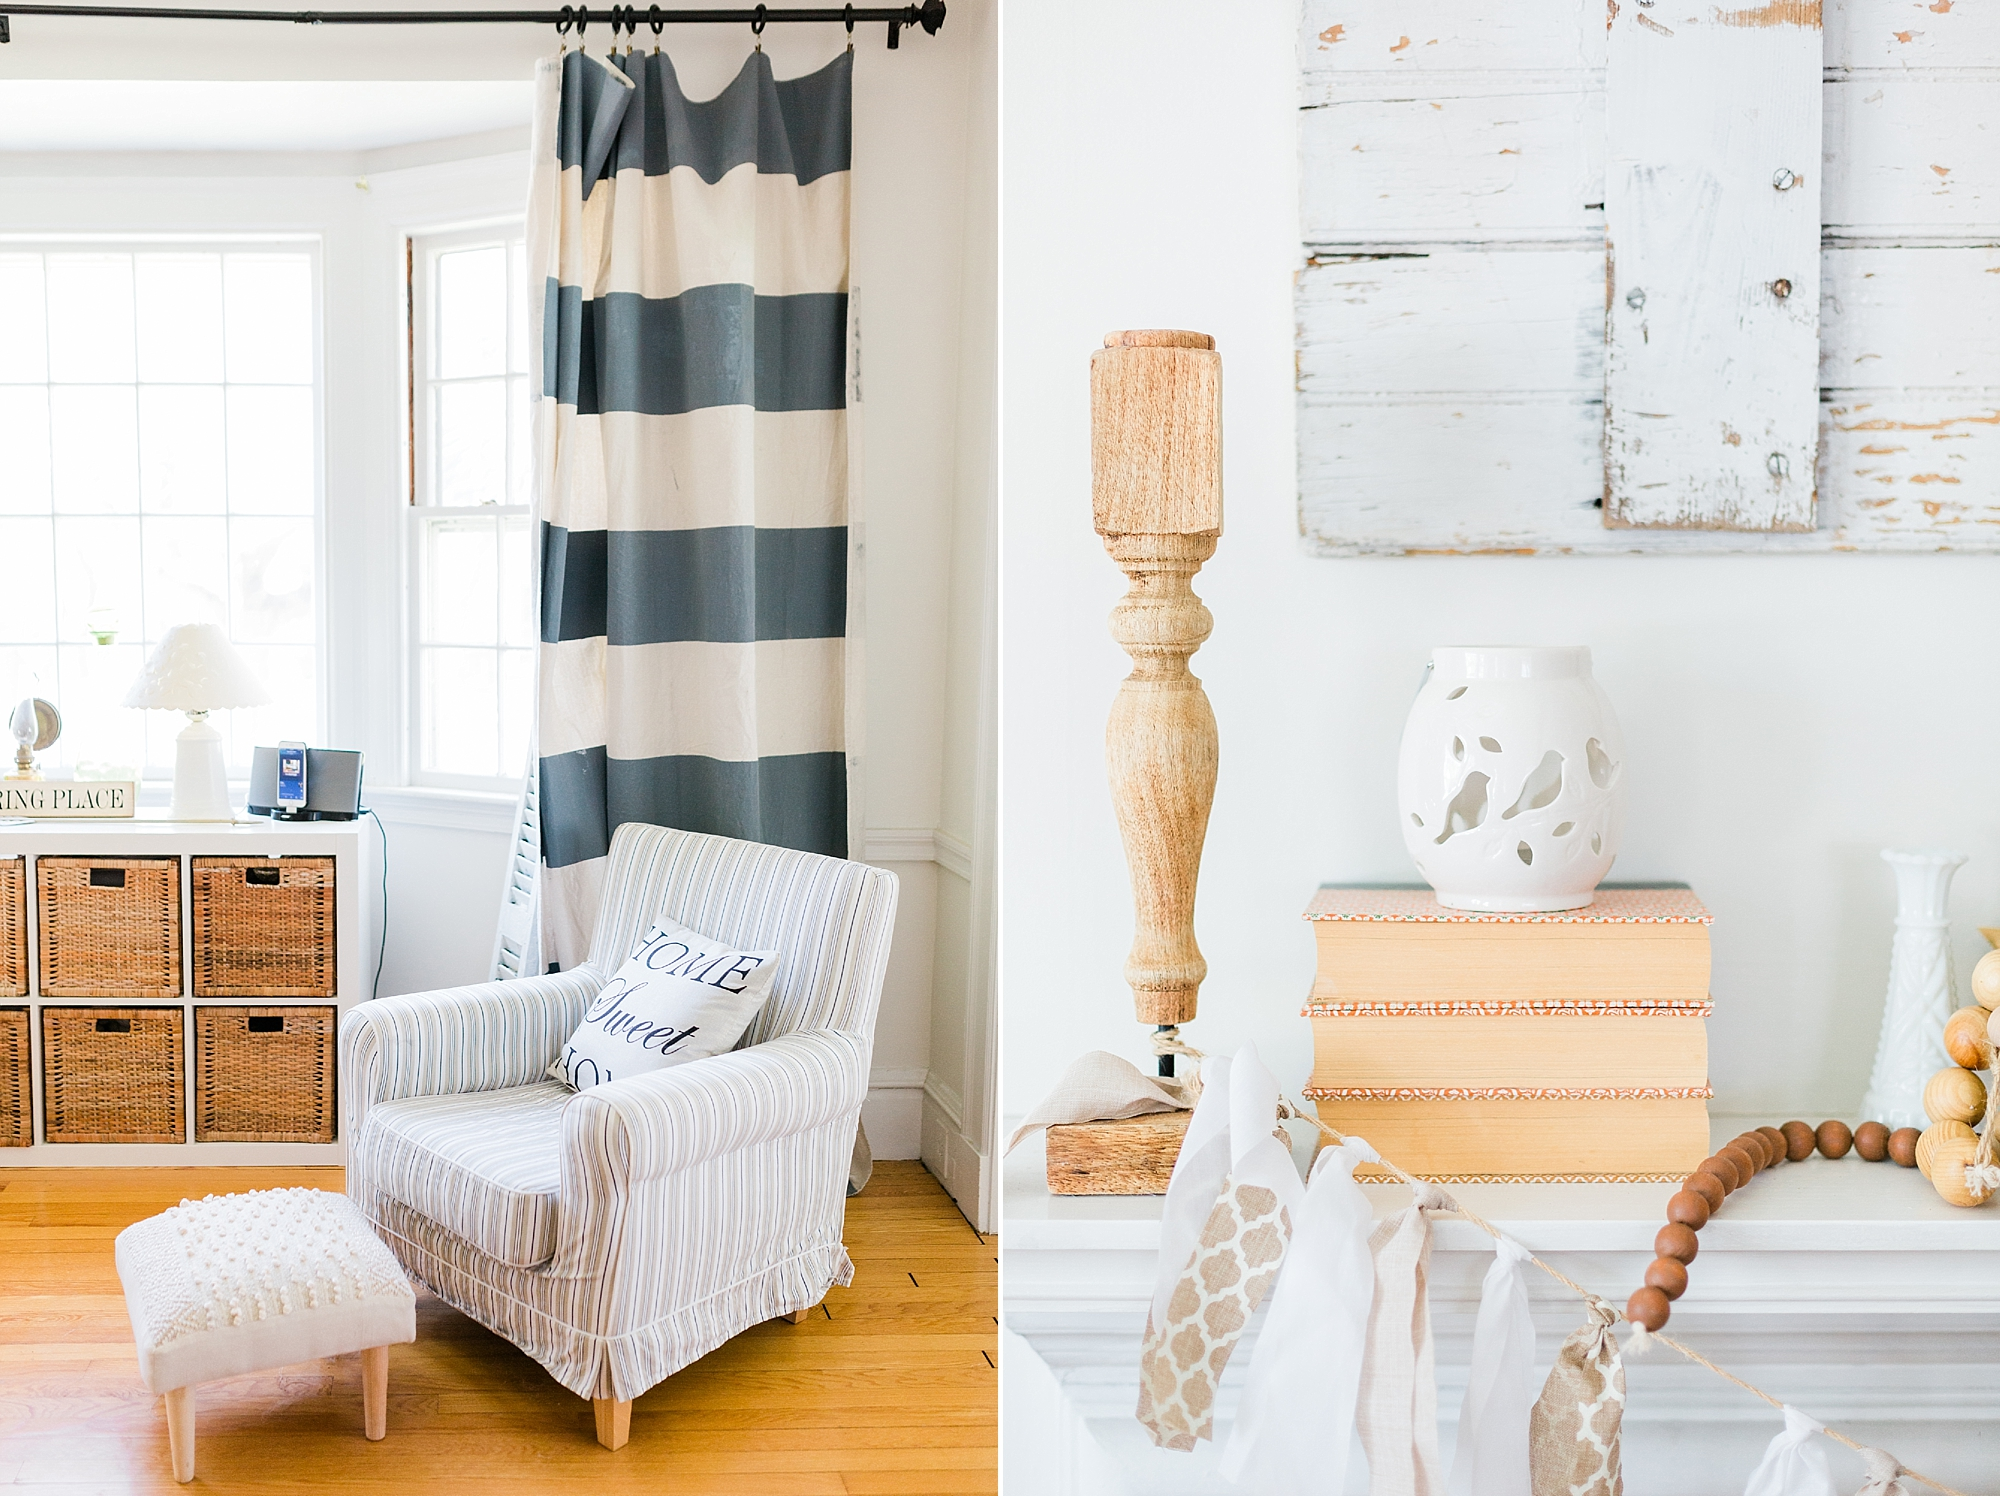 Interior Design - New Hampshire Home - Madison Rae Photography